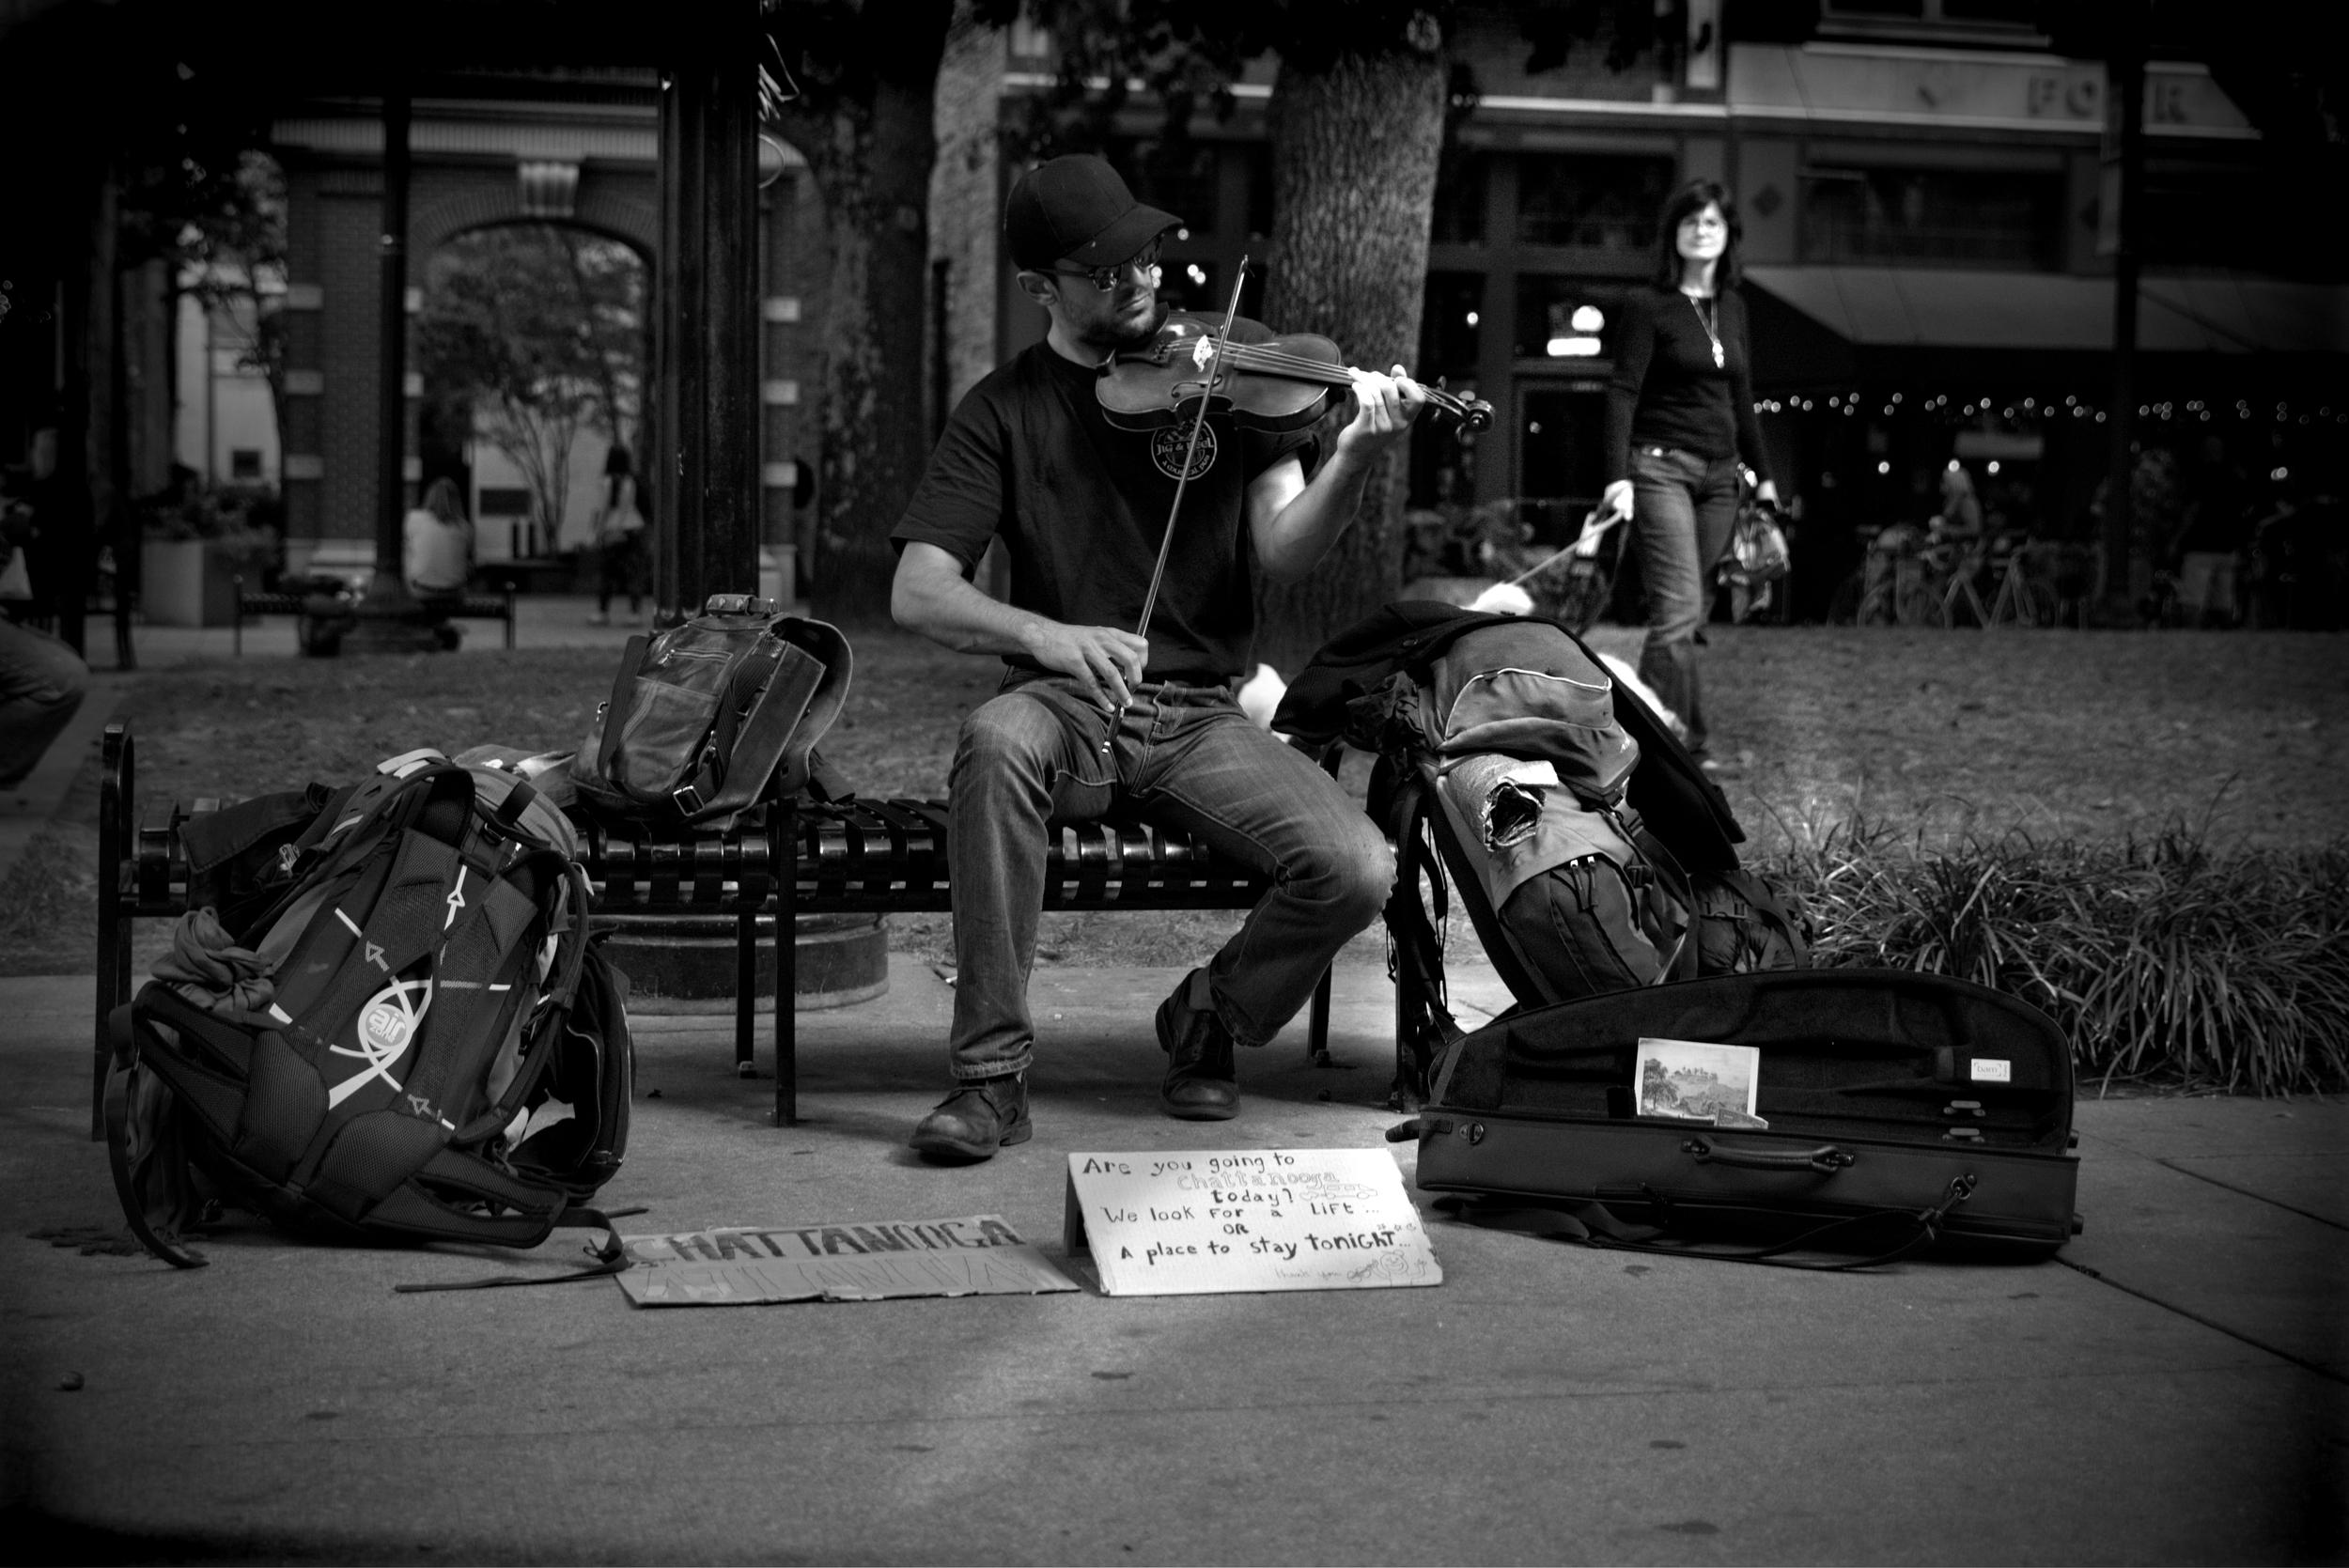 StreetMusicKnoxville5 copy.jpg